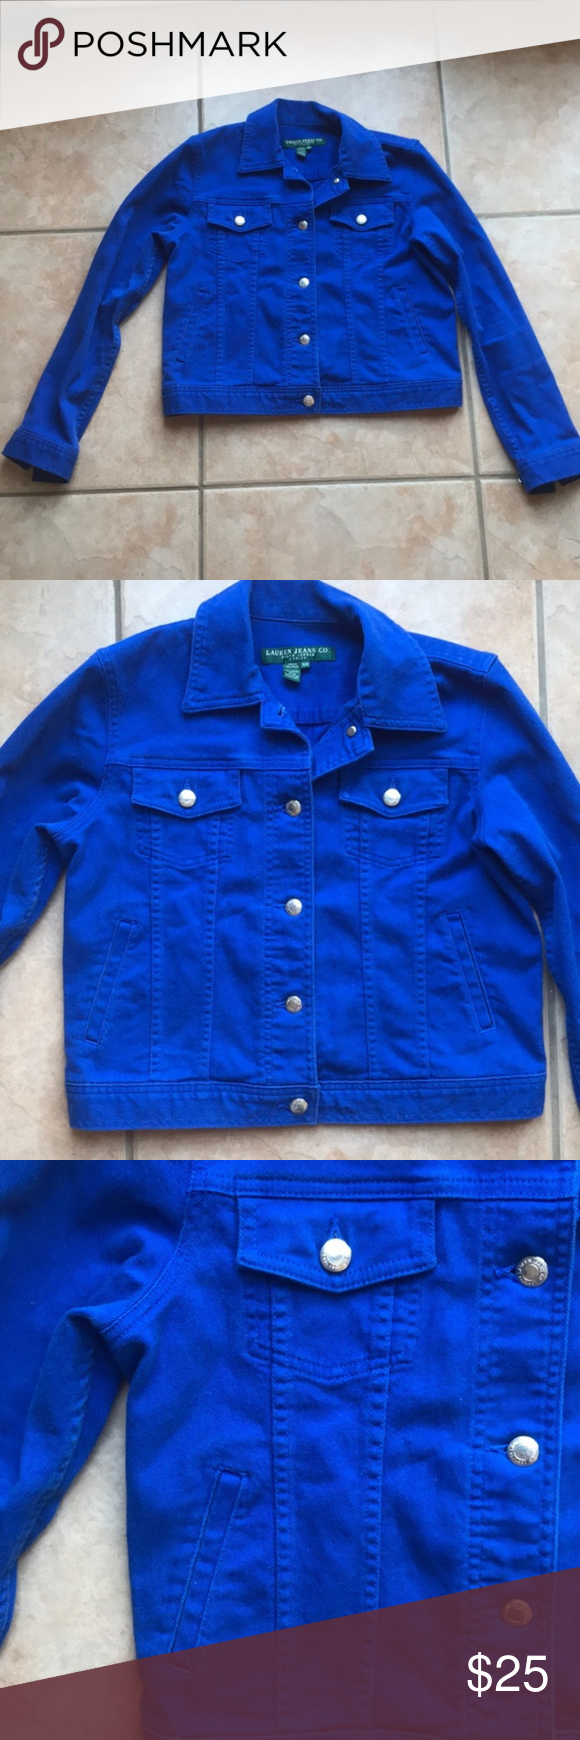 Euc Ralph Lauren Royal Blue Jean Jacket Like New Condition Denim Jacket From Ralph Lauren Royal Blue Color Siz Royal Blue Jeans Blue Jean Jacket Blue Jeans [ 1740 x 580 Pixel ]